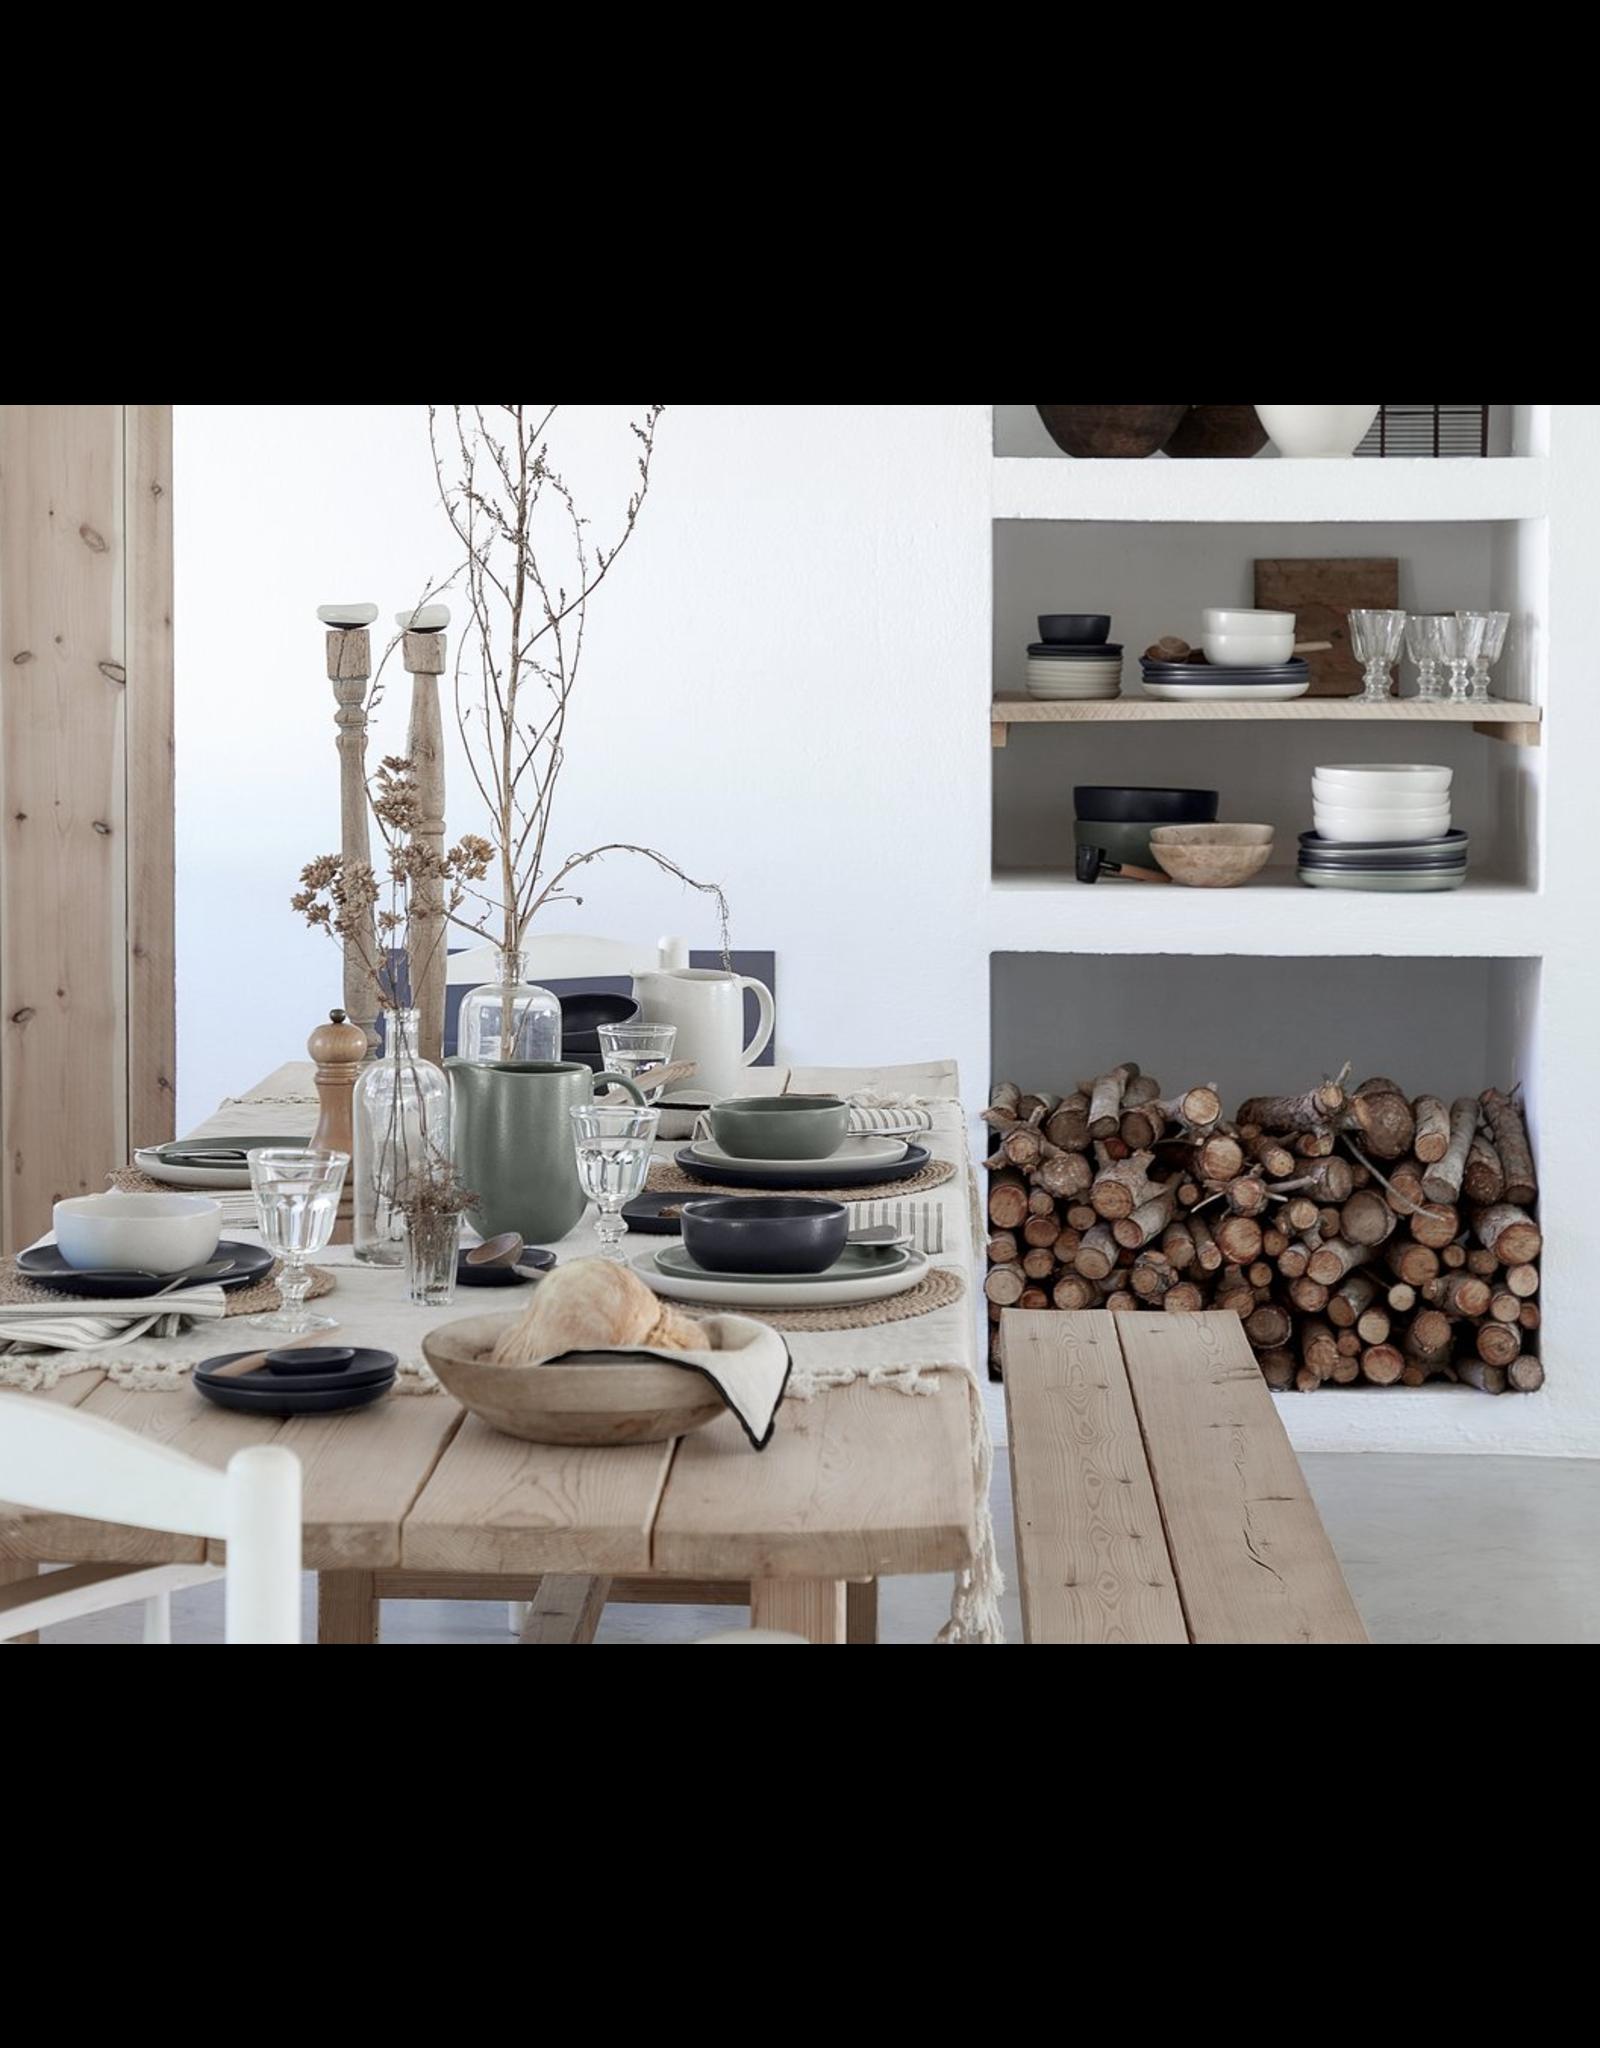 Kitchen Trend Mok Pacifica groen